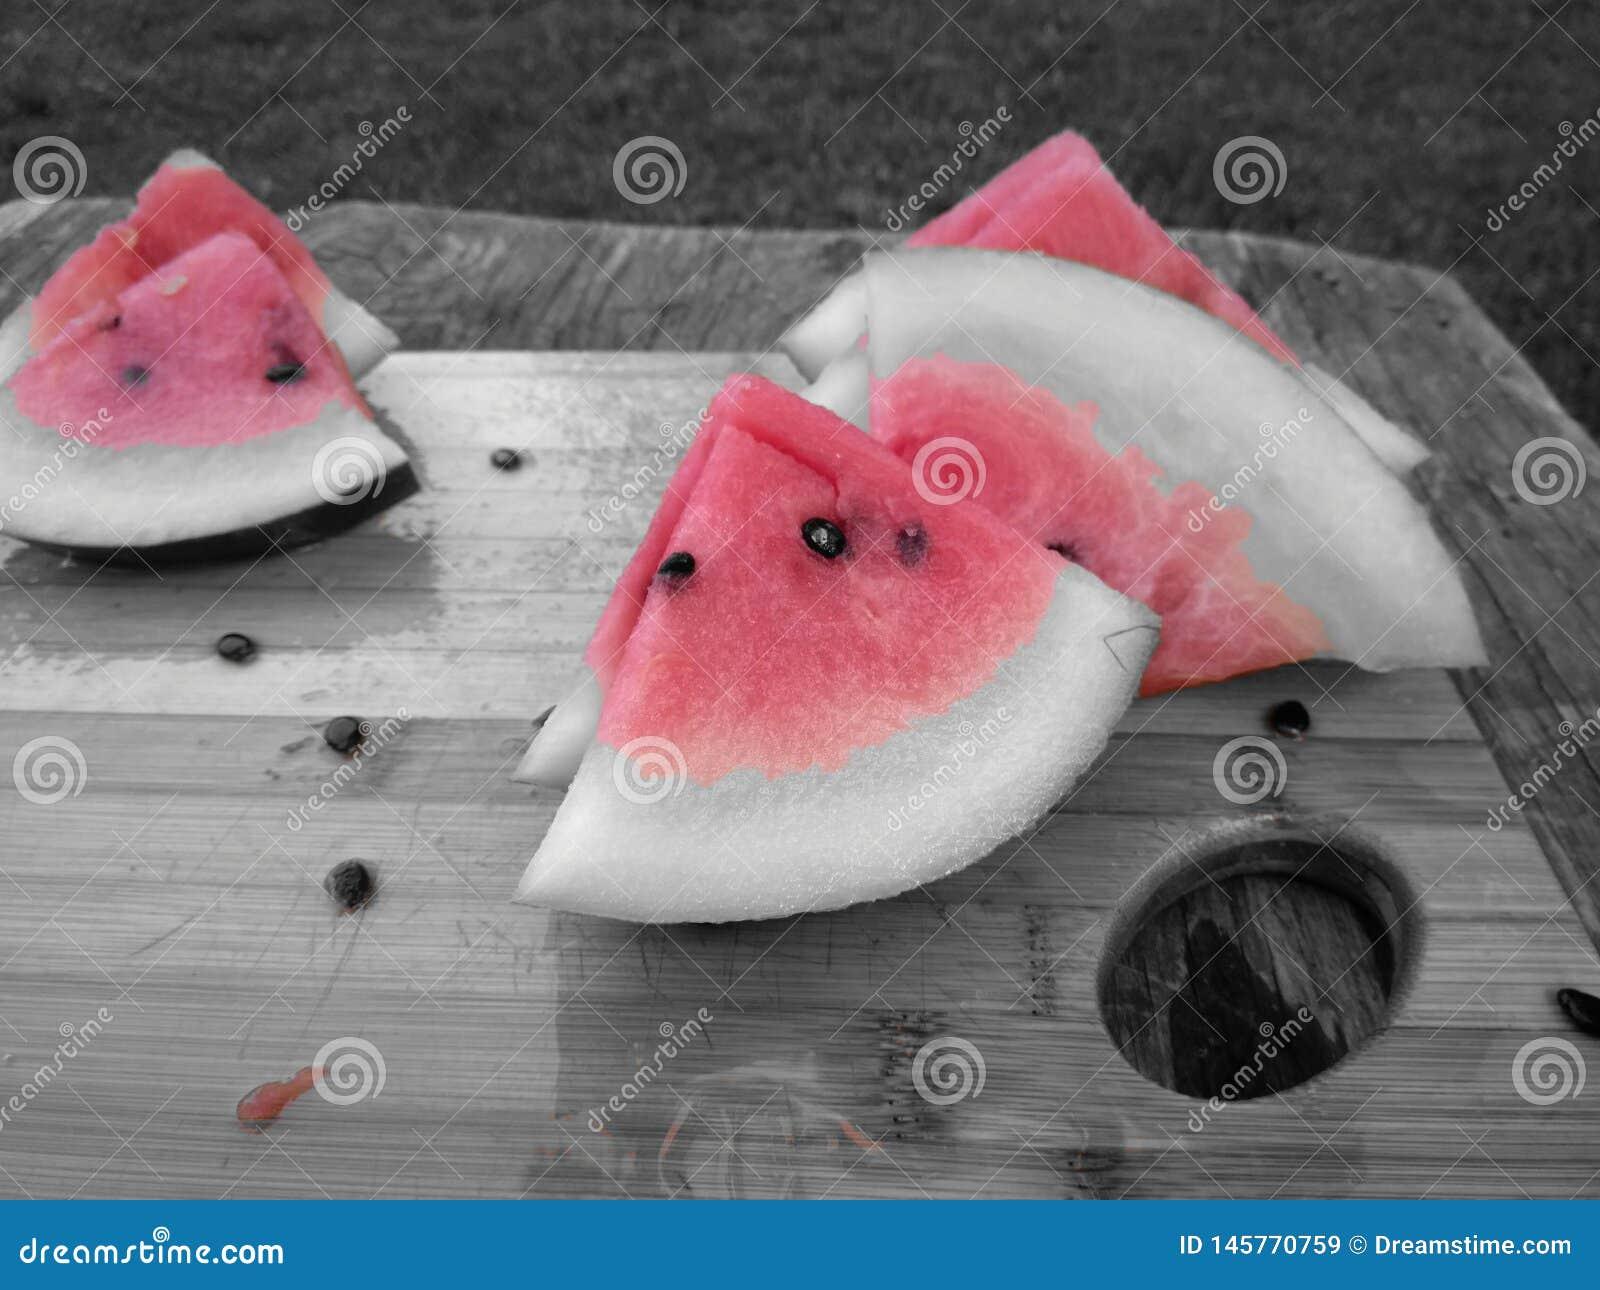 Abstracte watermeloenplakken